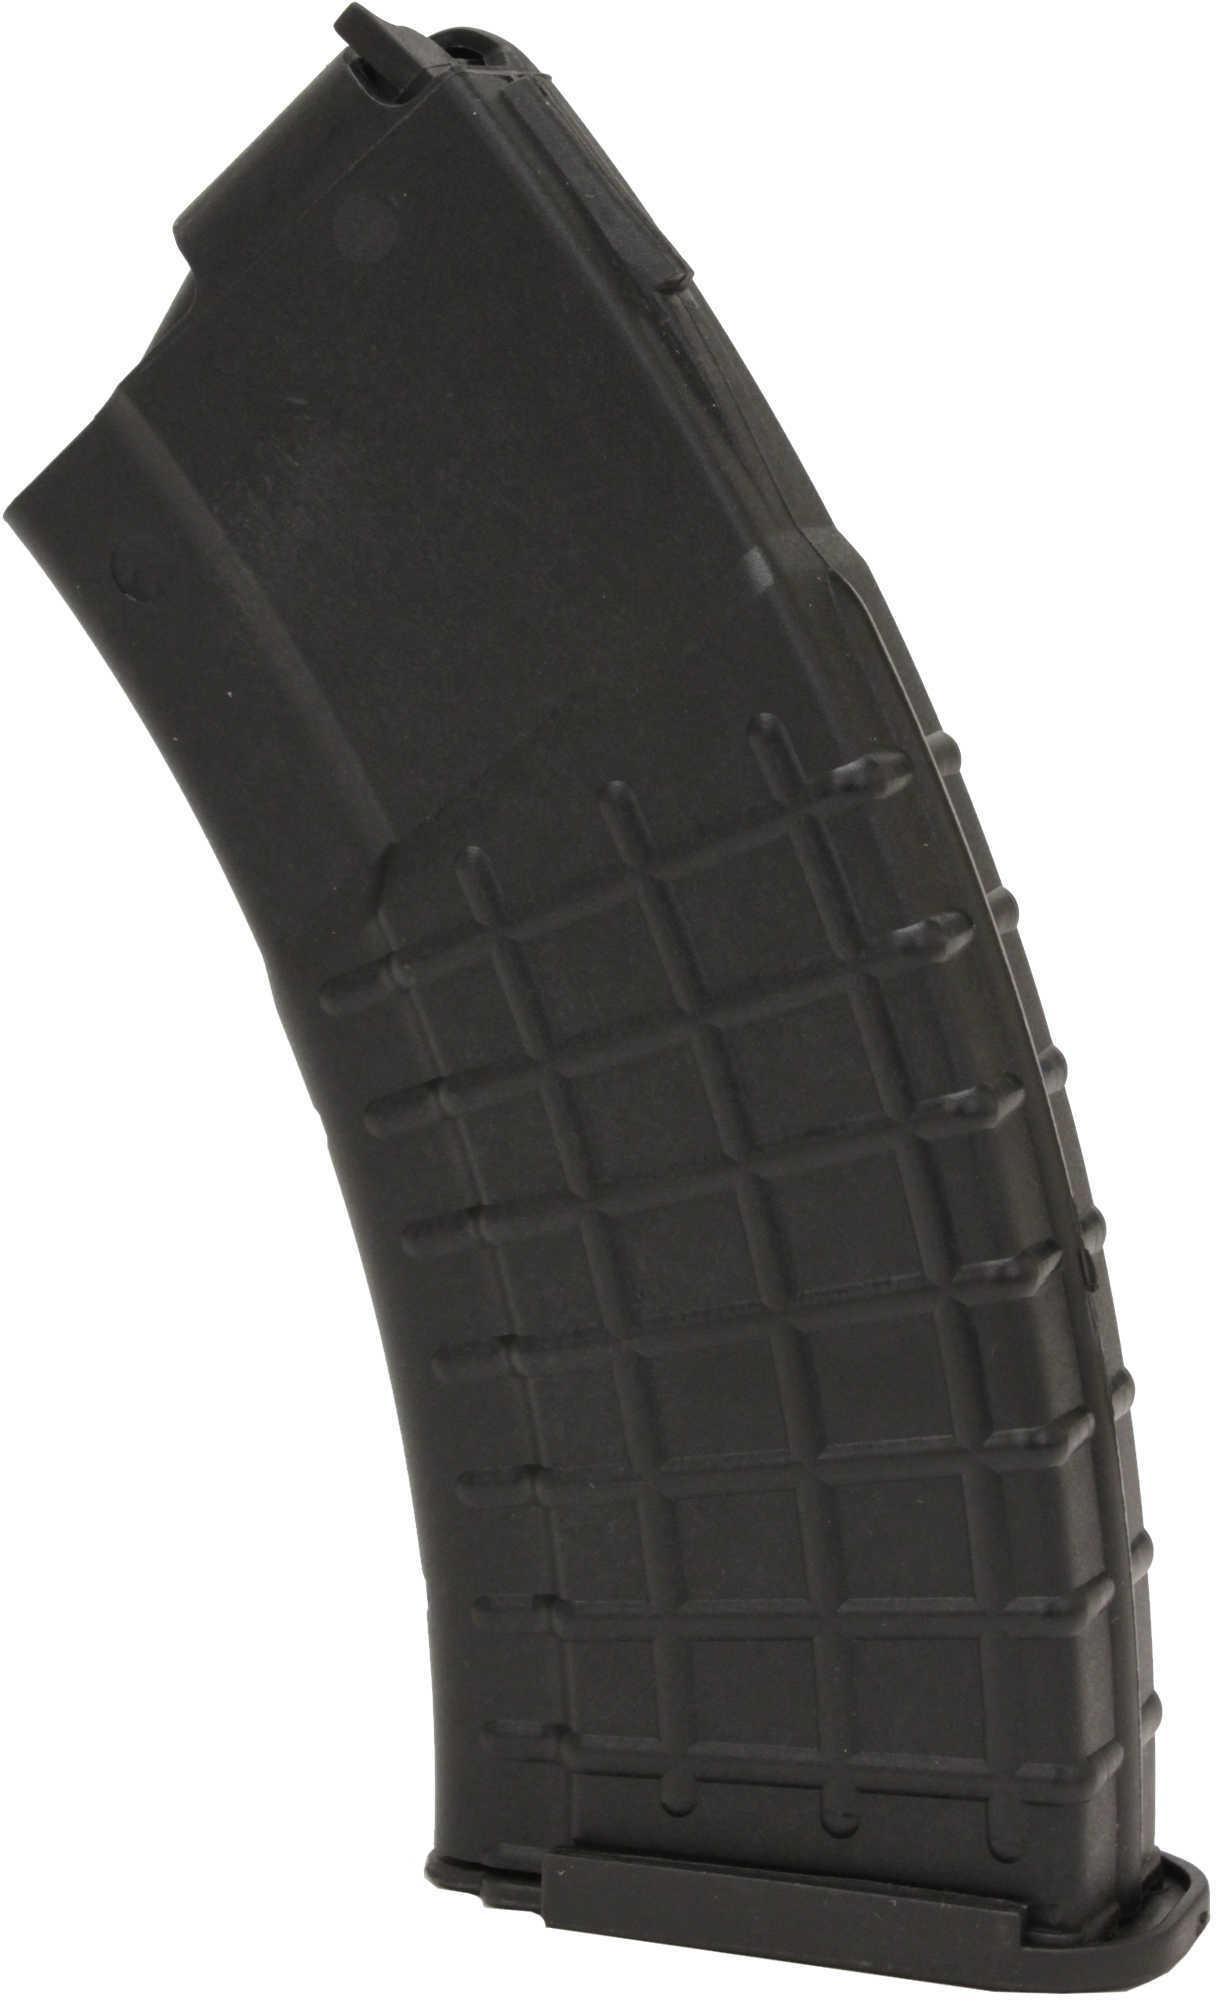 Mini-30 7.62X39mm Magazine 20 Round, Black Polymer Md: Rug-A22